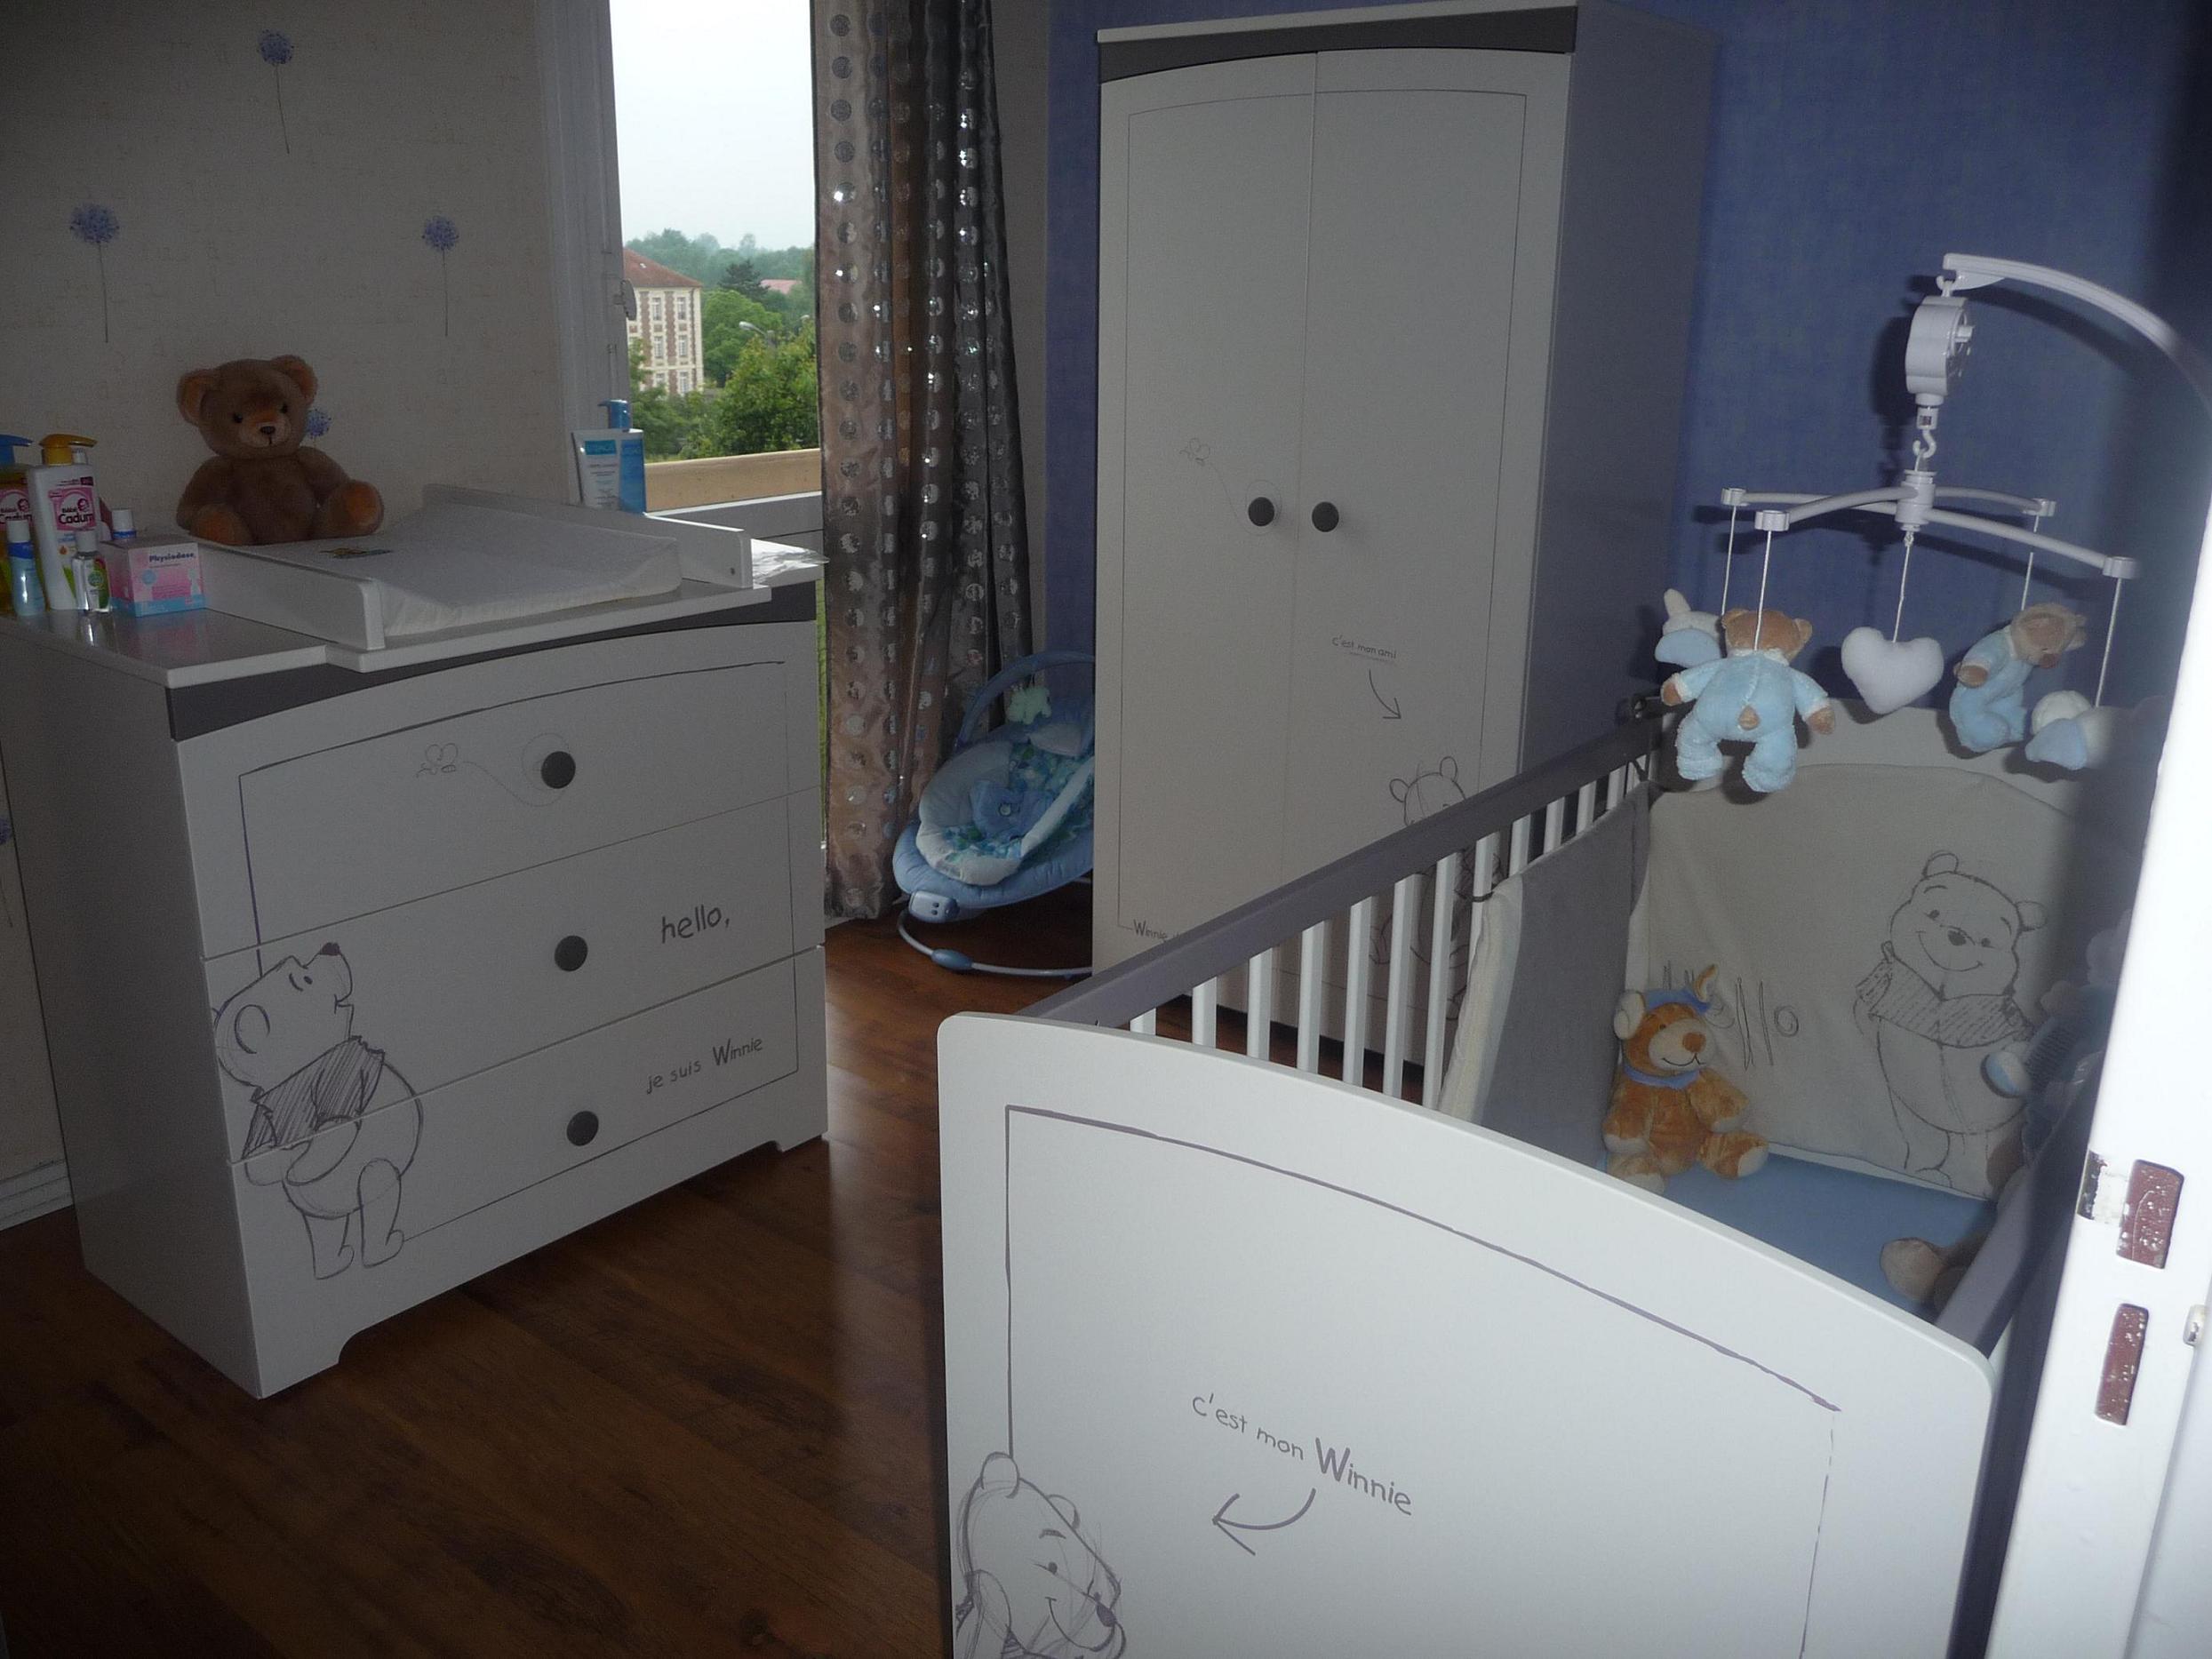 chambre de bb winnie l ourson amazing charmant chambre winnie ourson aubert avec net chambre. Black Bedroom Furniture Sets. Home Design Ideas